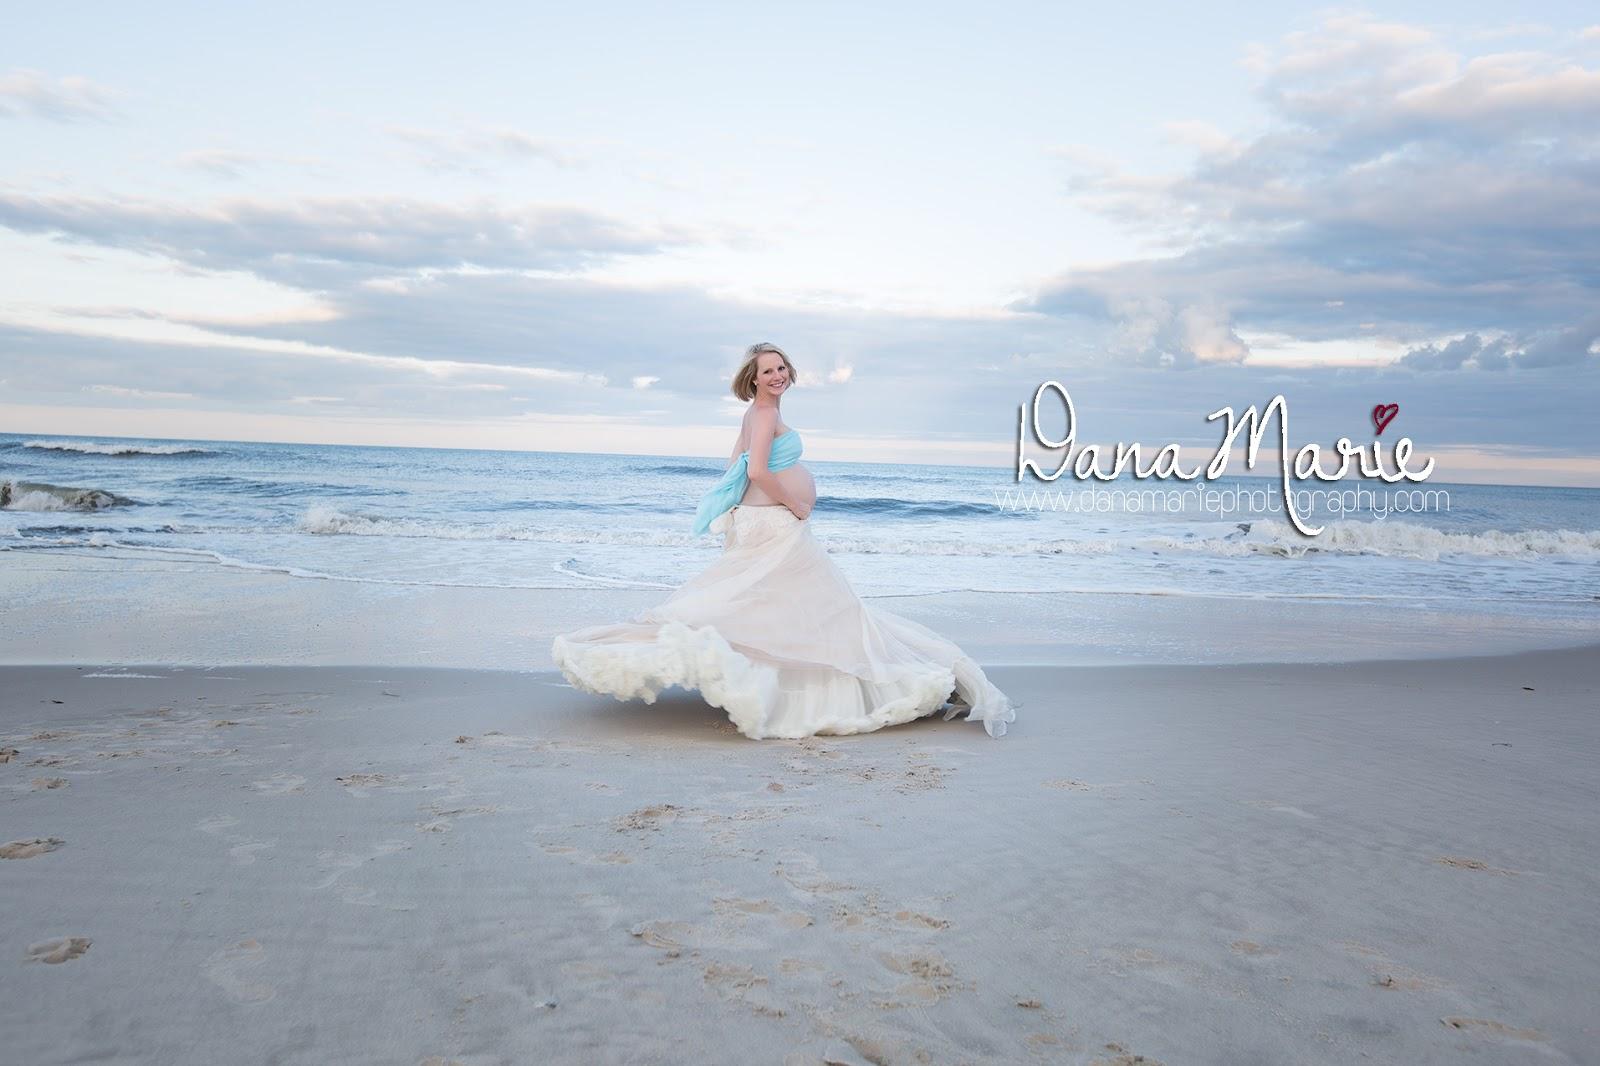 Dana Marie Photography: Maternity Beach Photos in her Wedding Dress ...